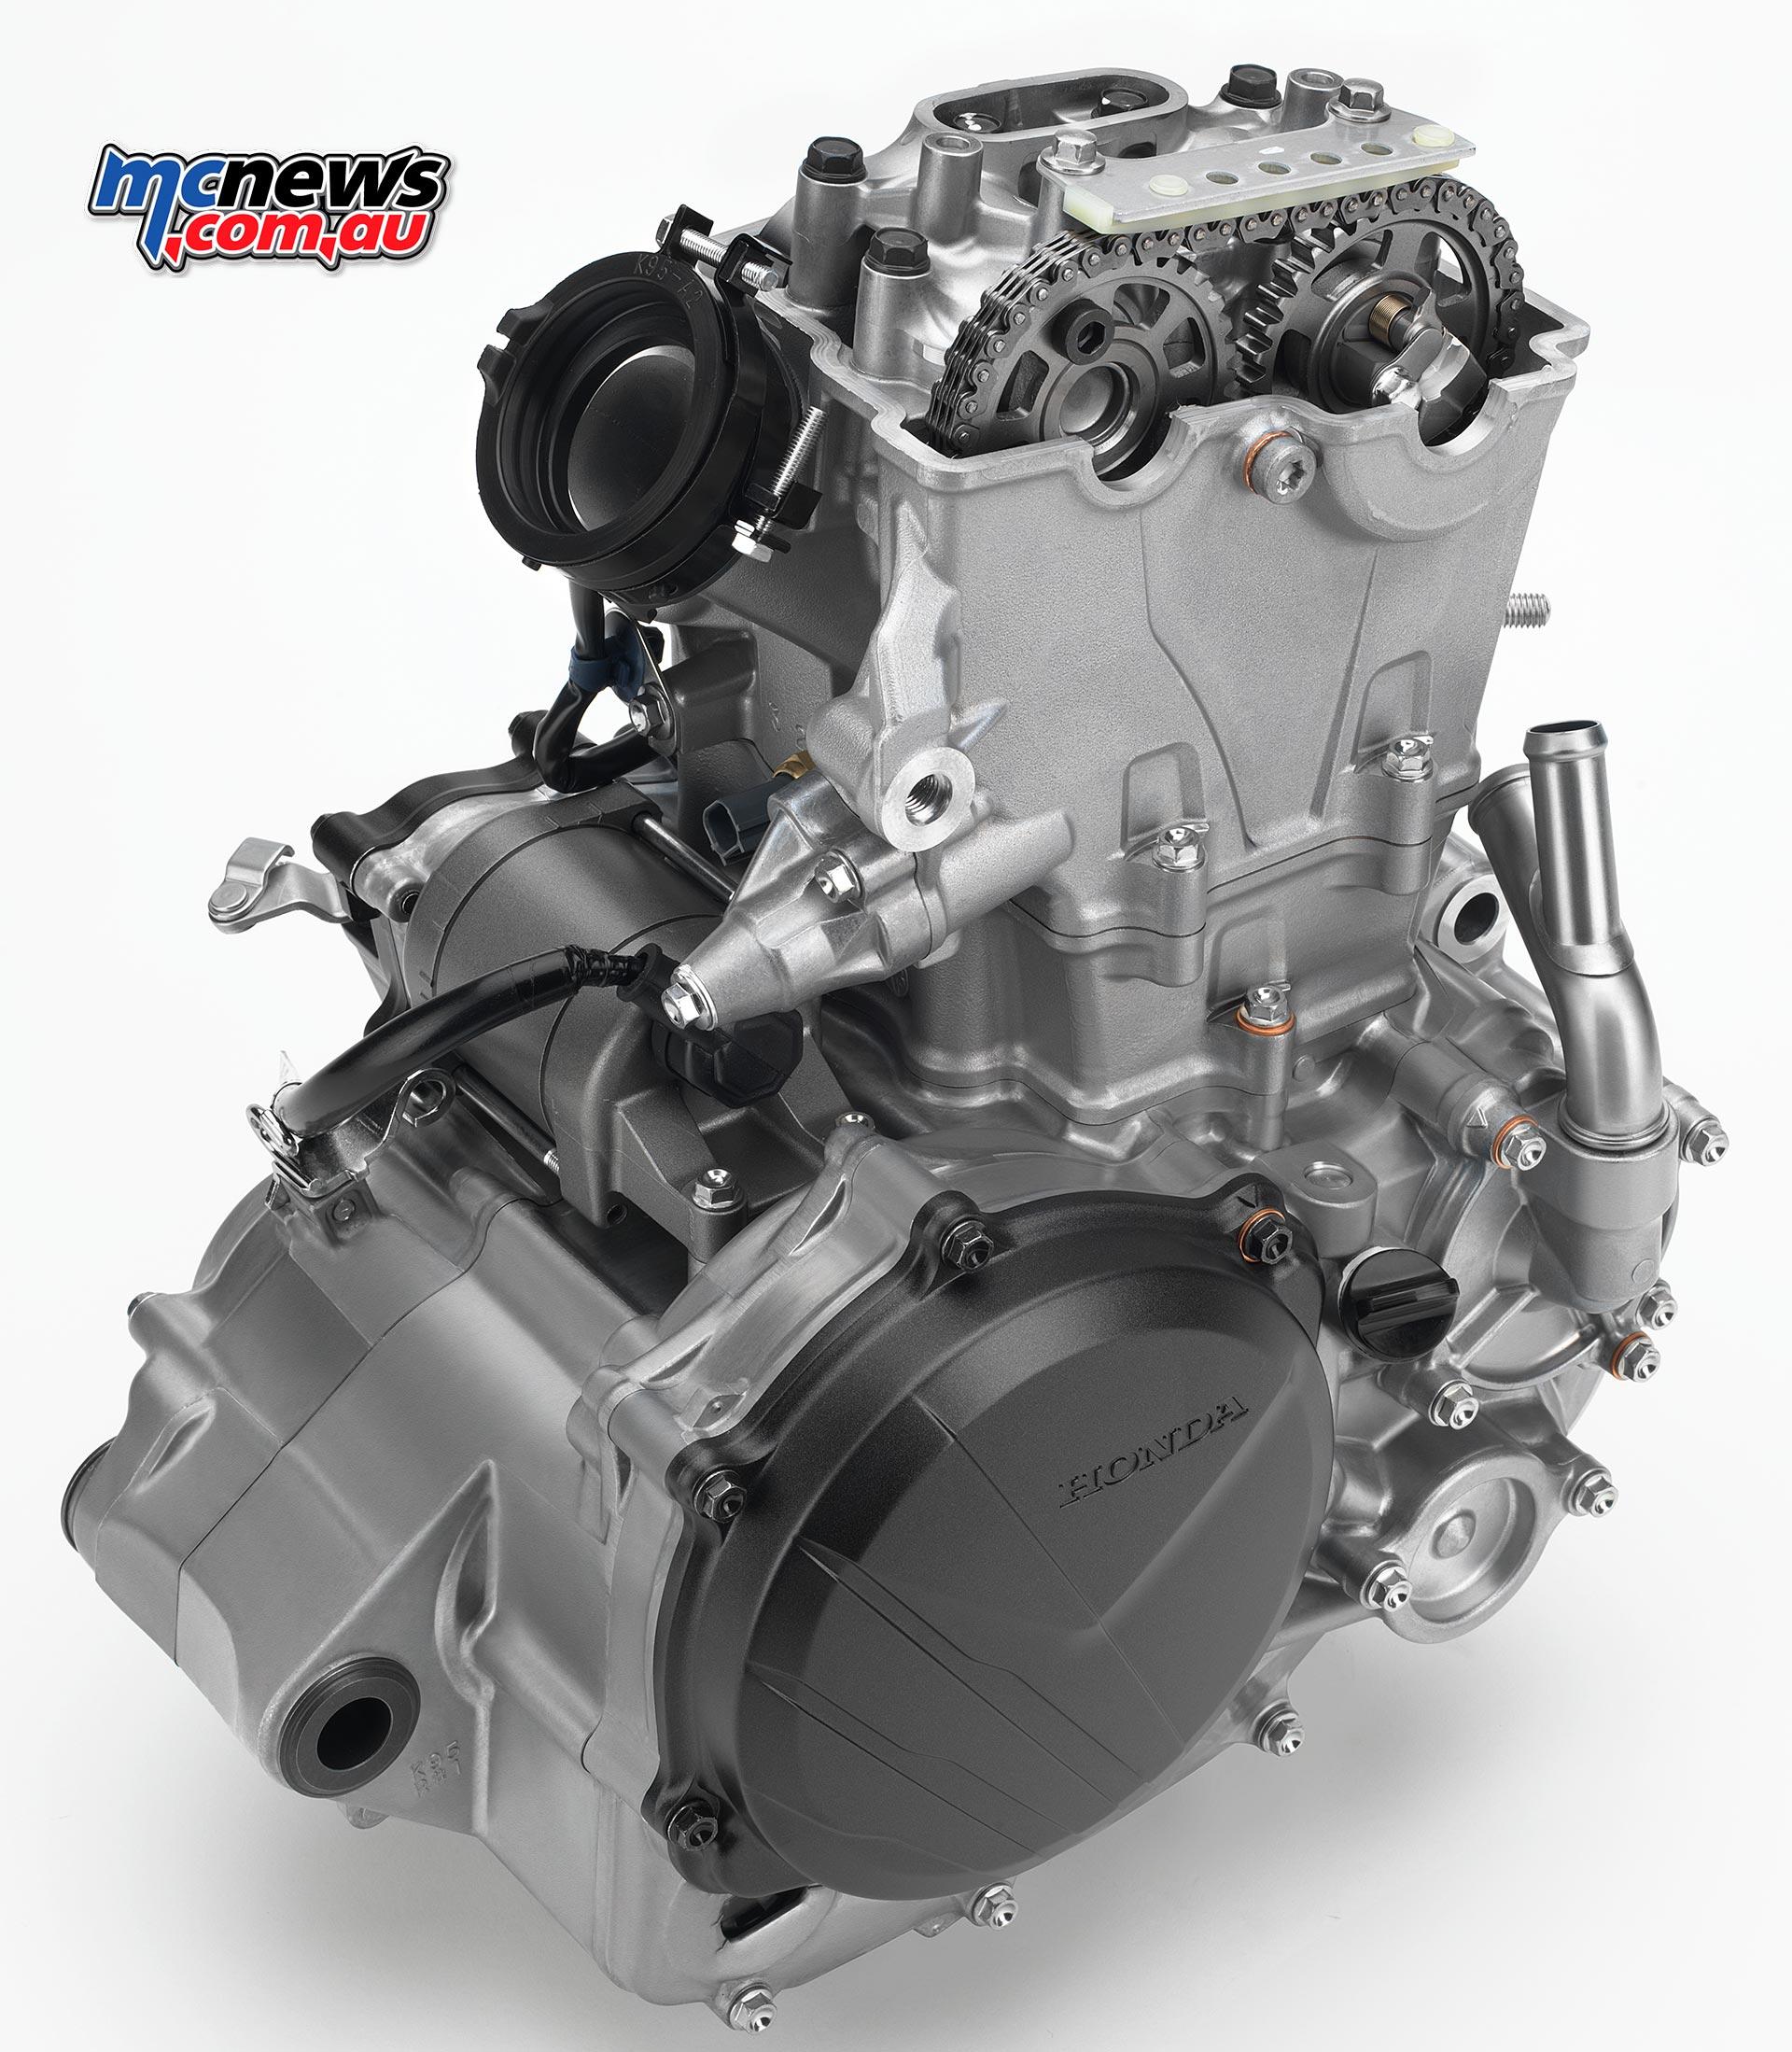 crfr  dohc engine crfr chassis mcnewscomau